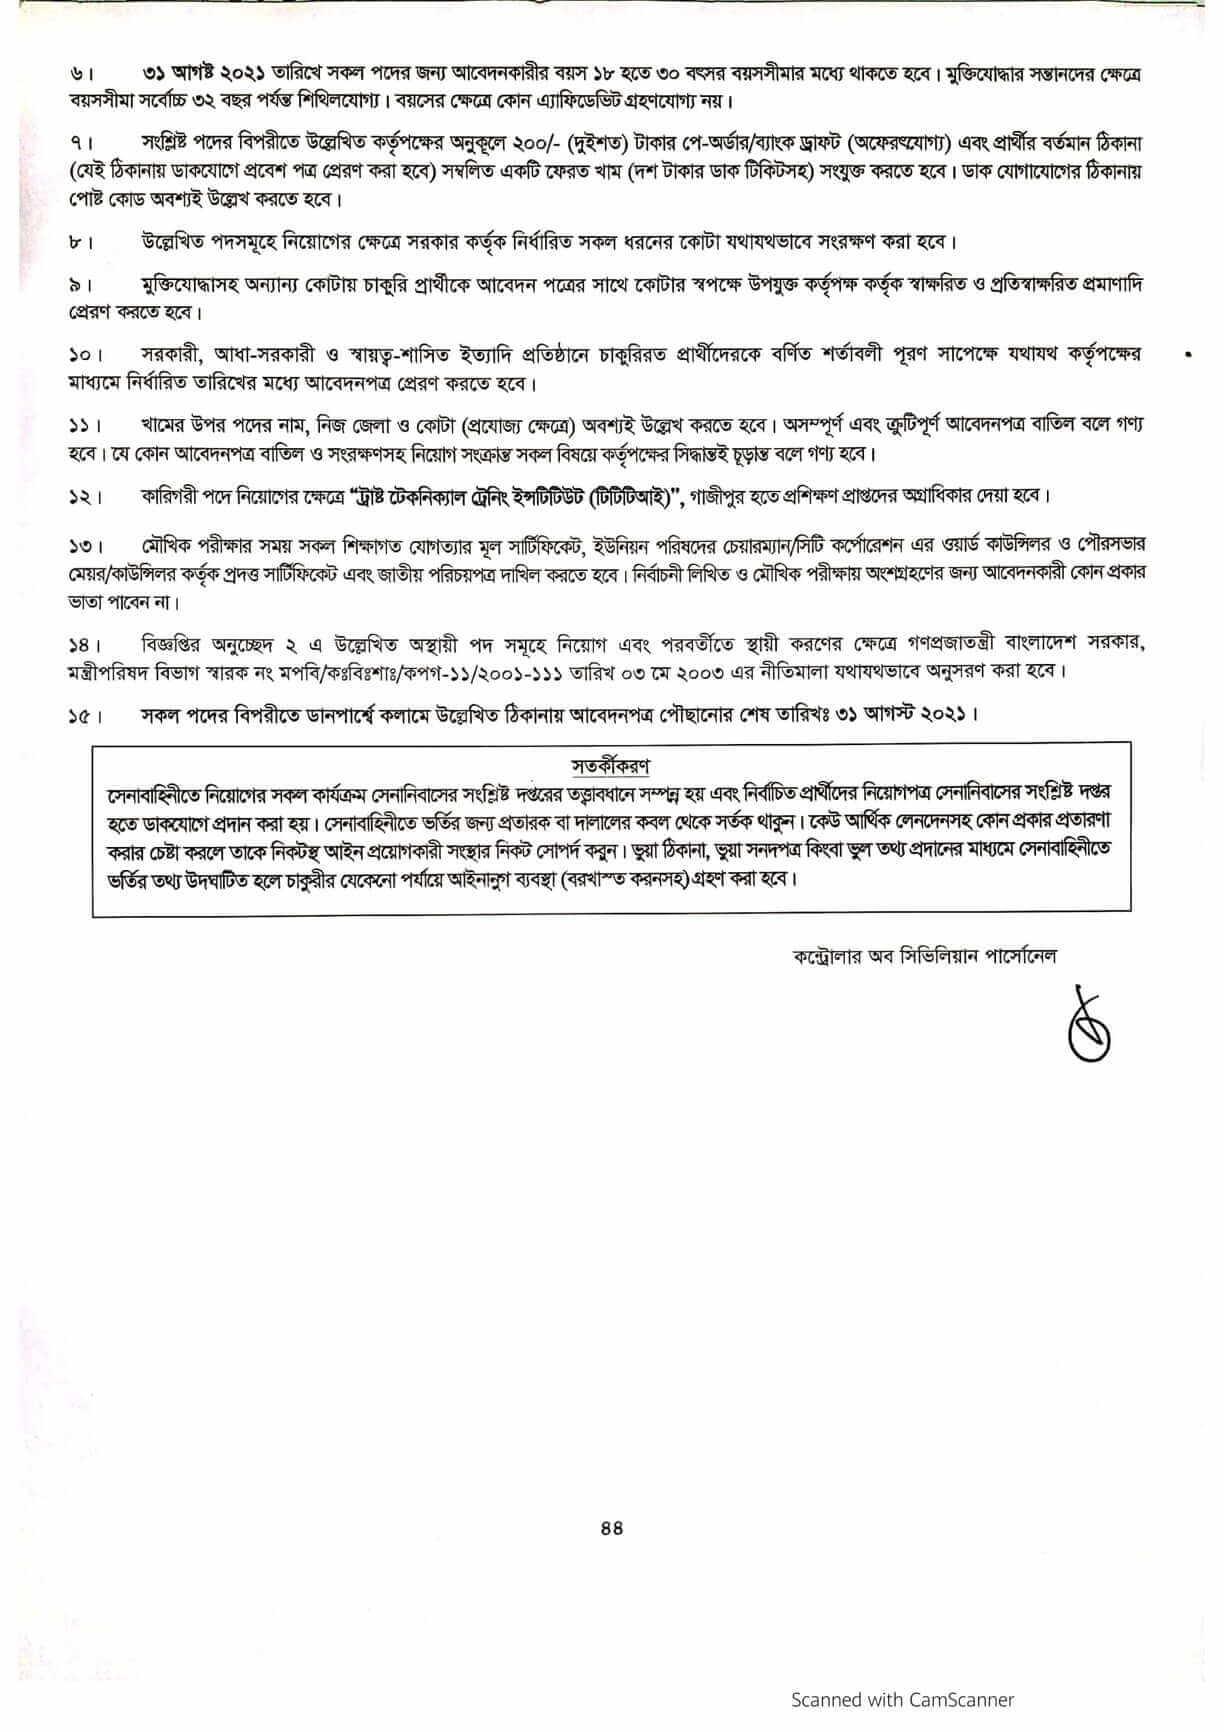 www.army.mil.bd application form download